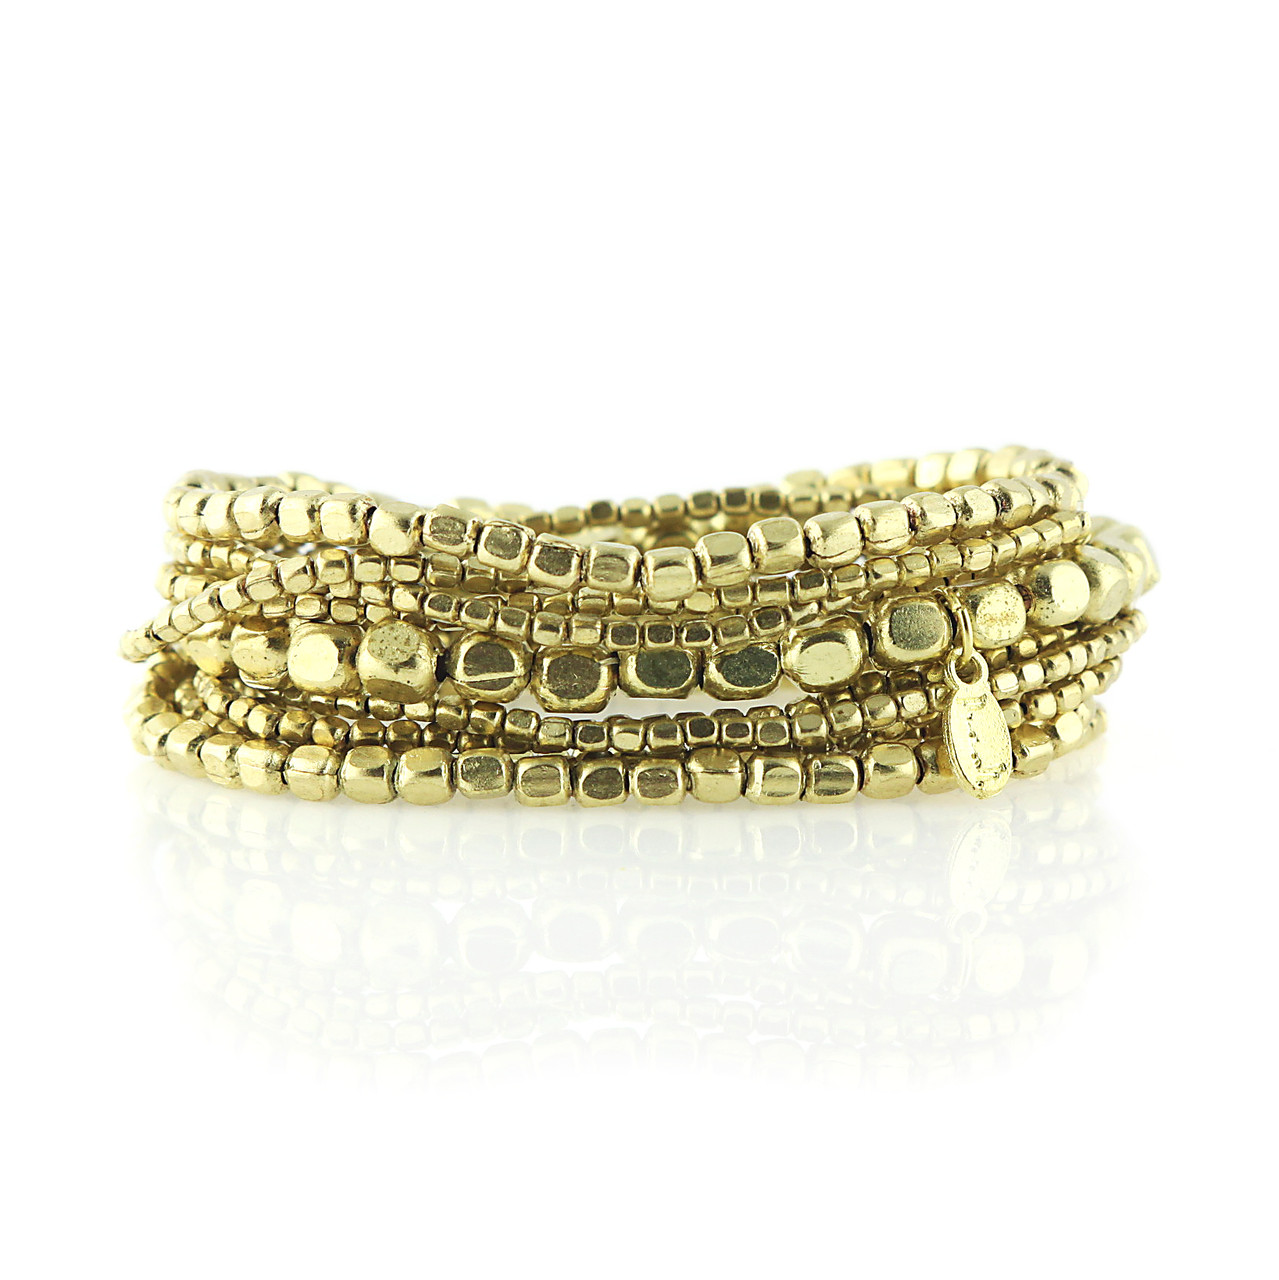 Gold Liquid beaded cuff bracelet-Presh by Nicole Apostoli 969a5e310